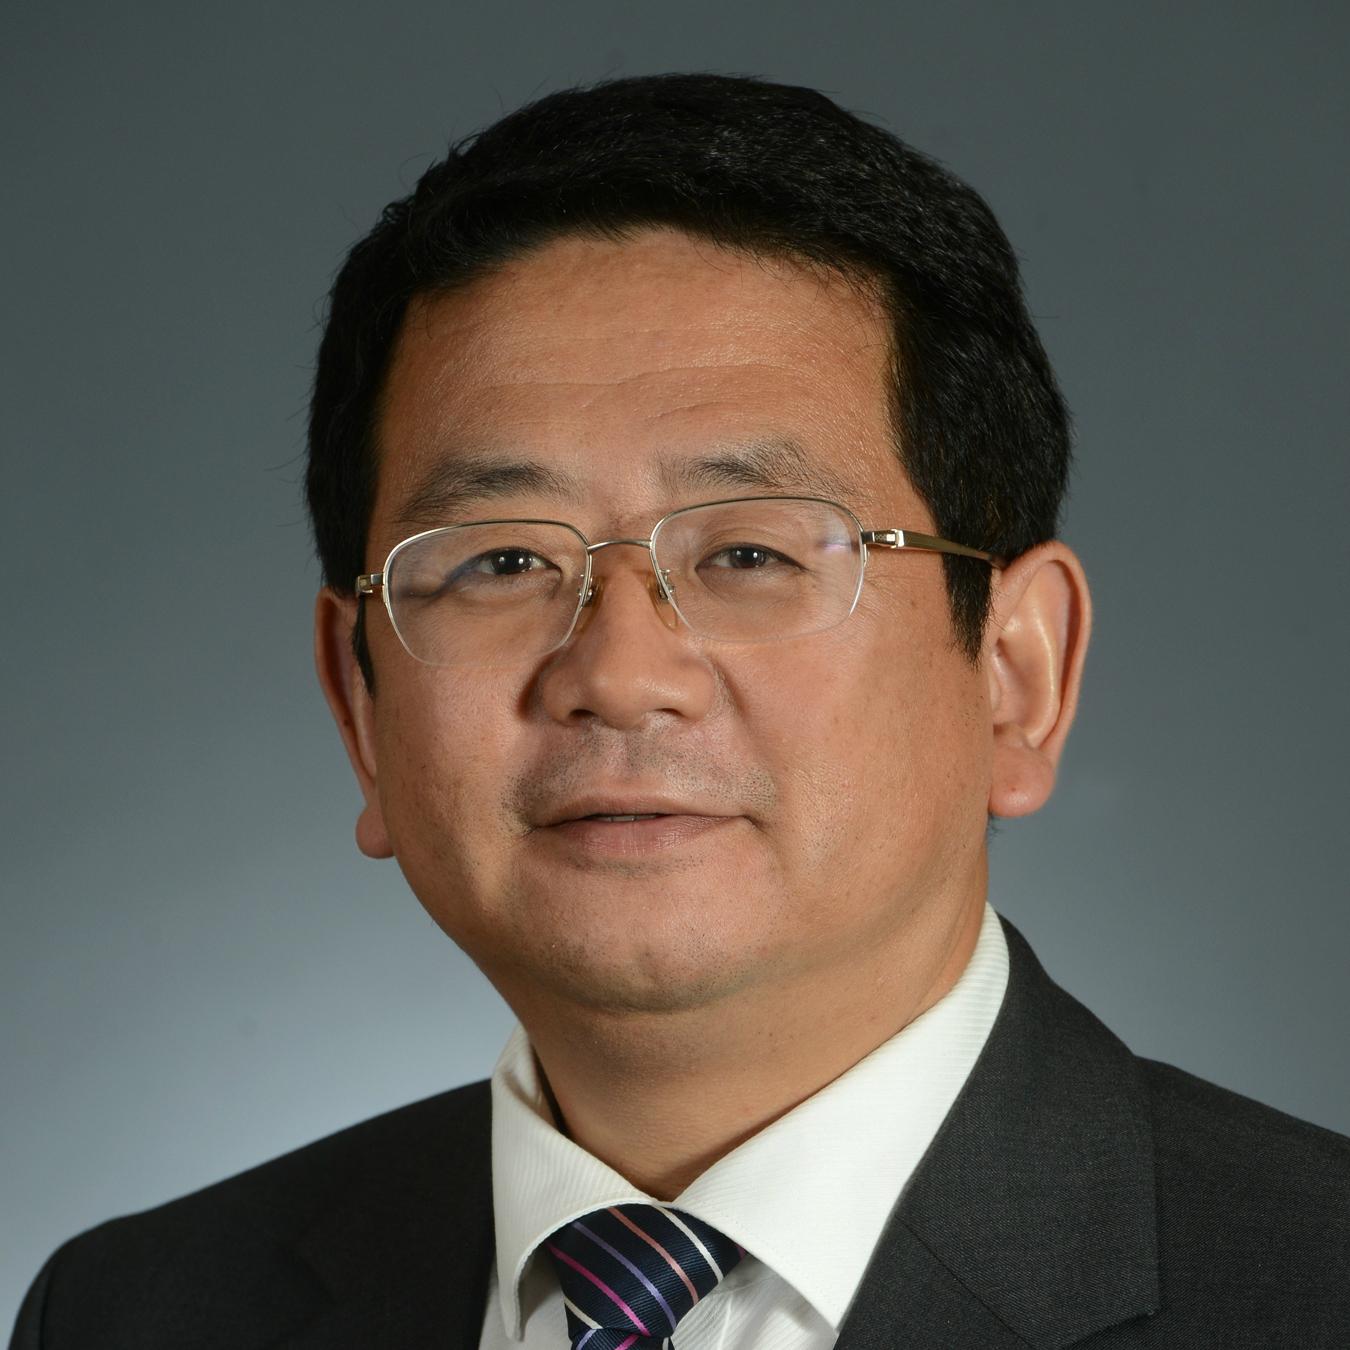 GAOTONG ZHANG